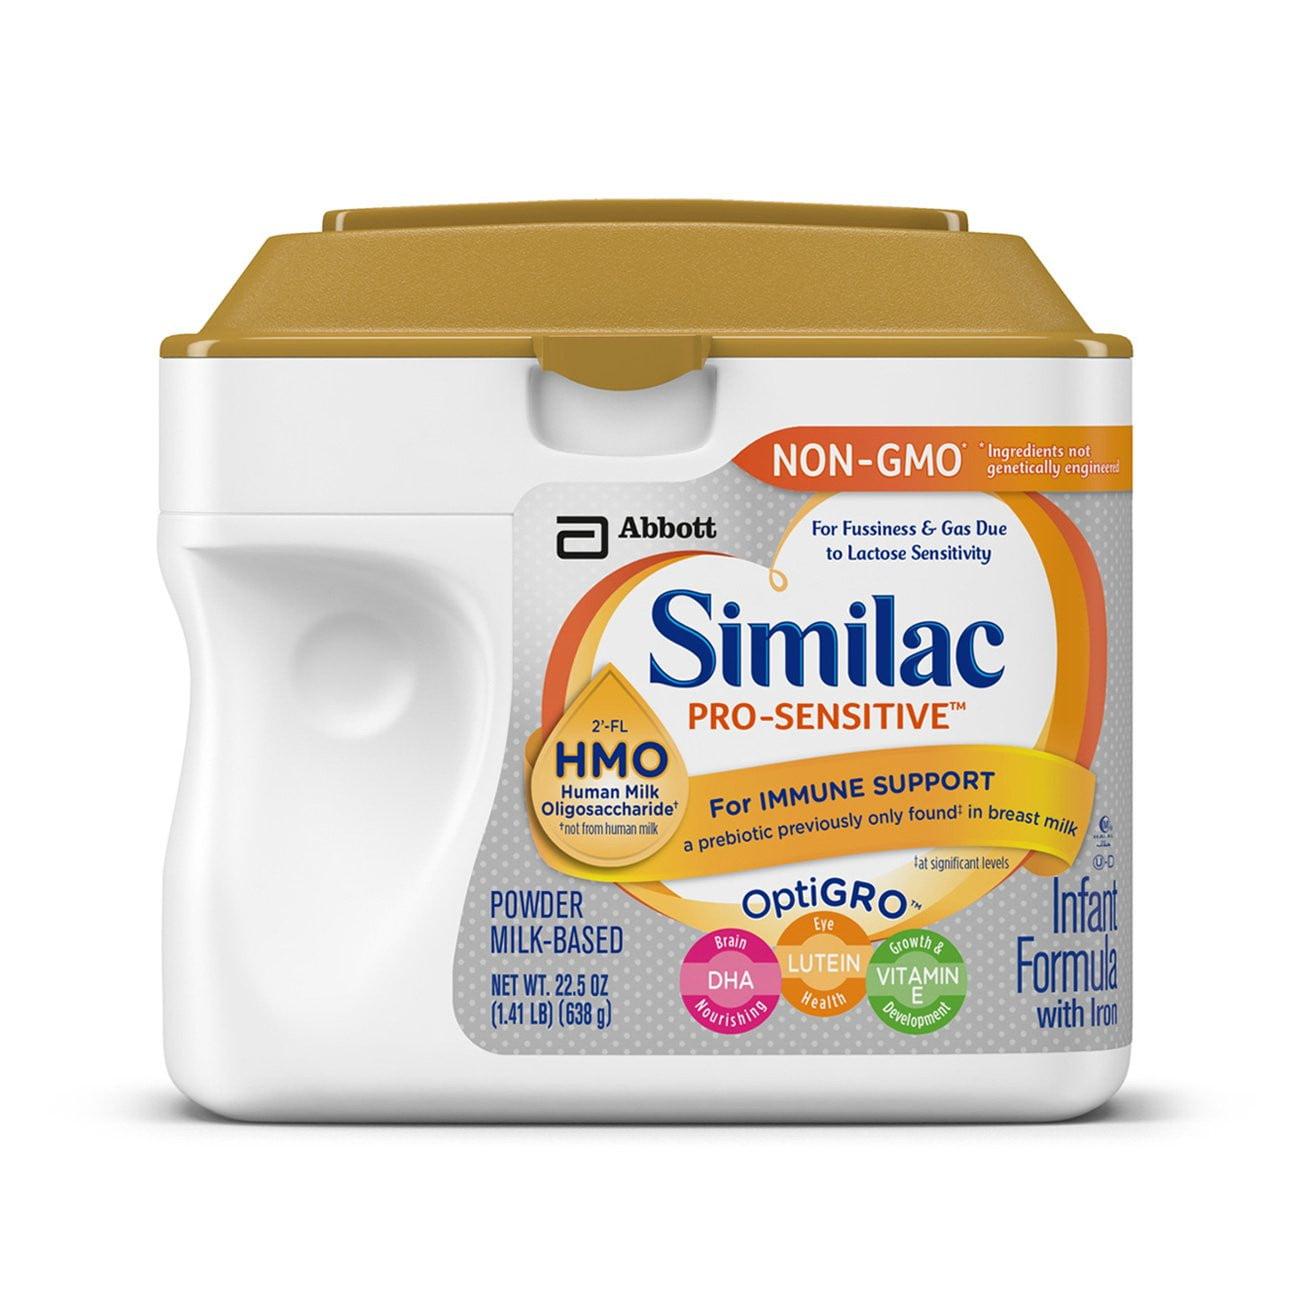 Similac Pro-Sensitive Infant Formula with 2-FL Human Milk Oligosaccharide* (HMO) for Immune Support 22.5 ounces Pack of 6 (Lid Color Varies)